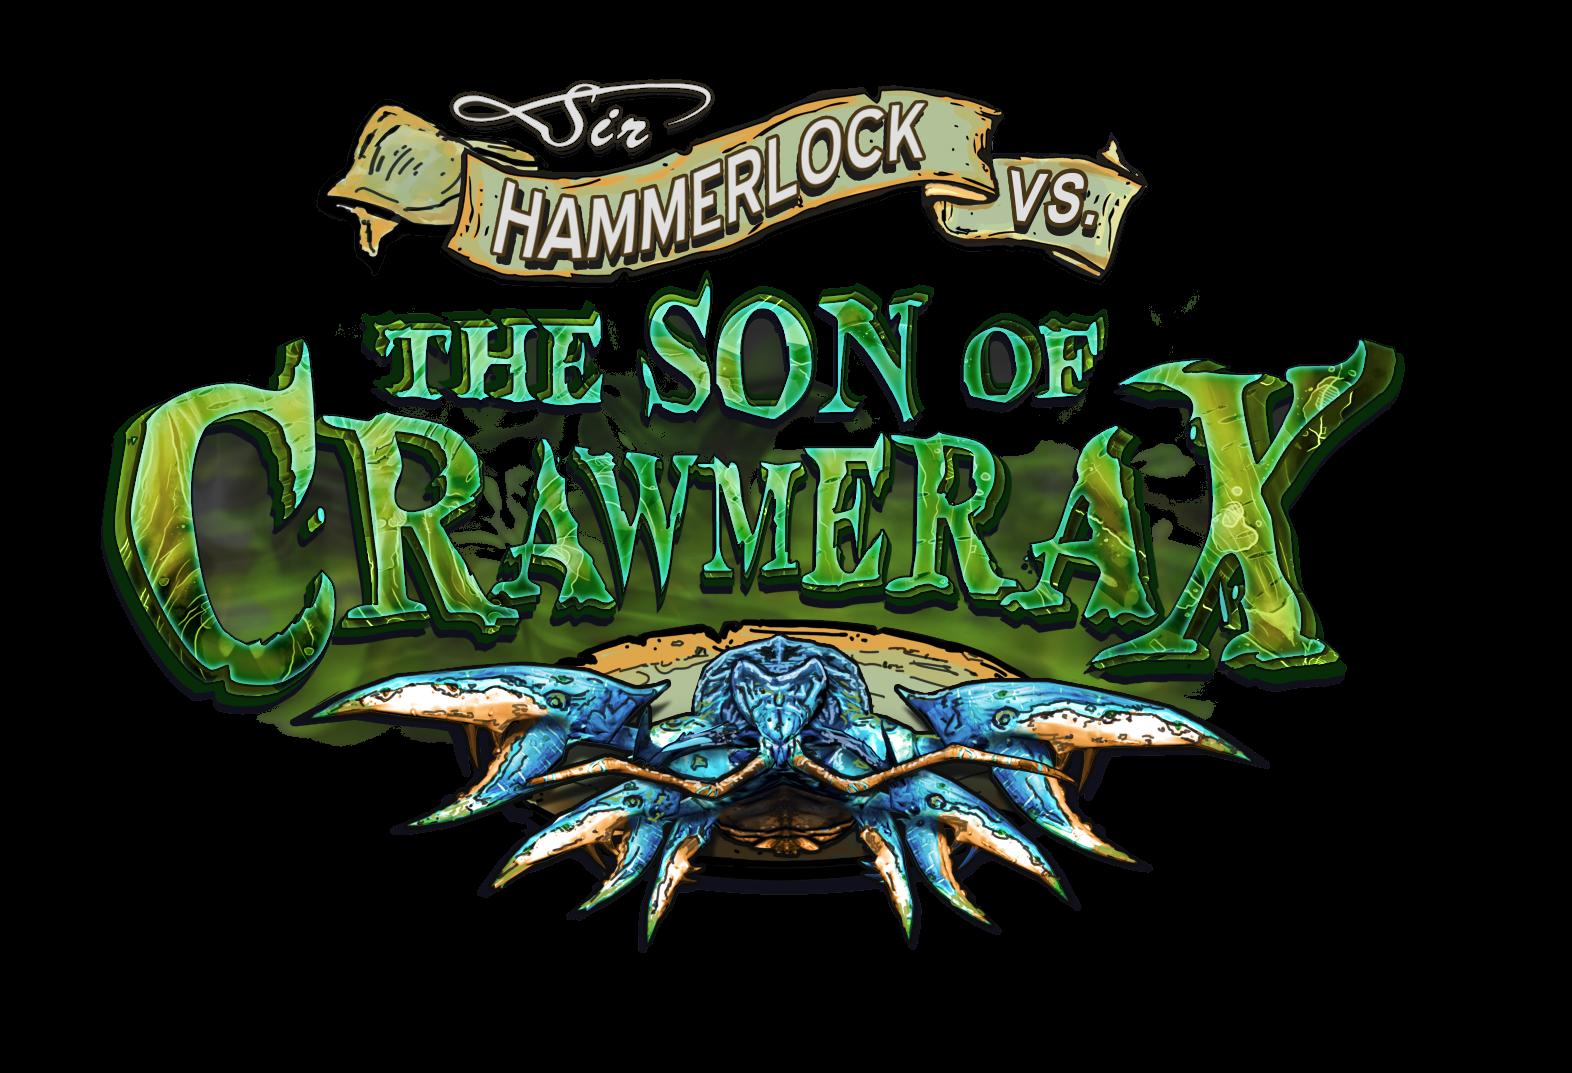 Sir Hammerlock vs. the Son of Crawmerax.